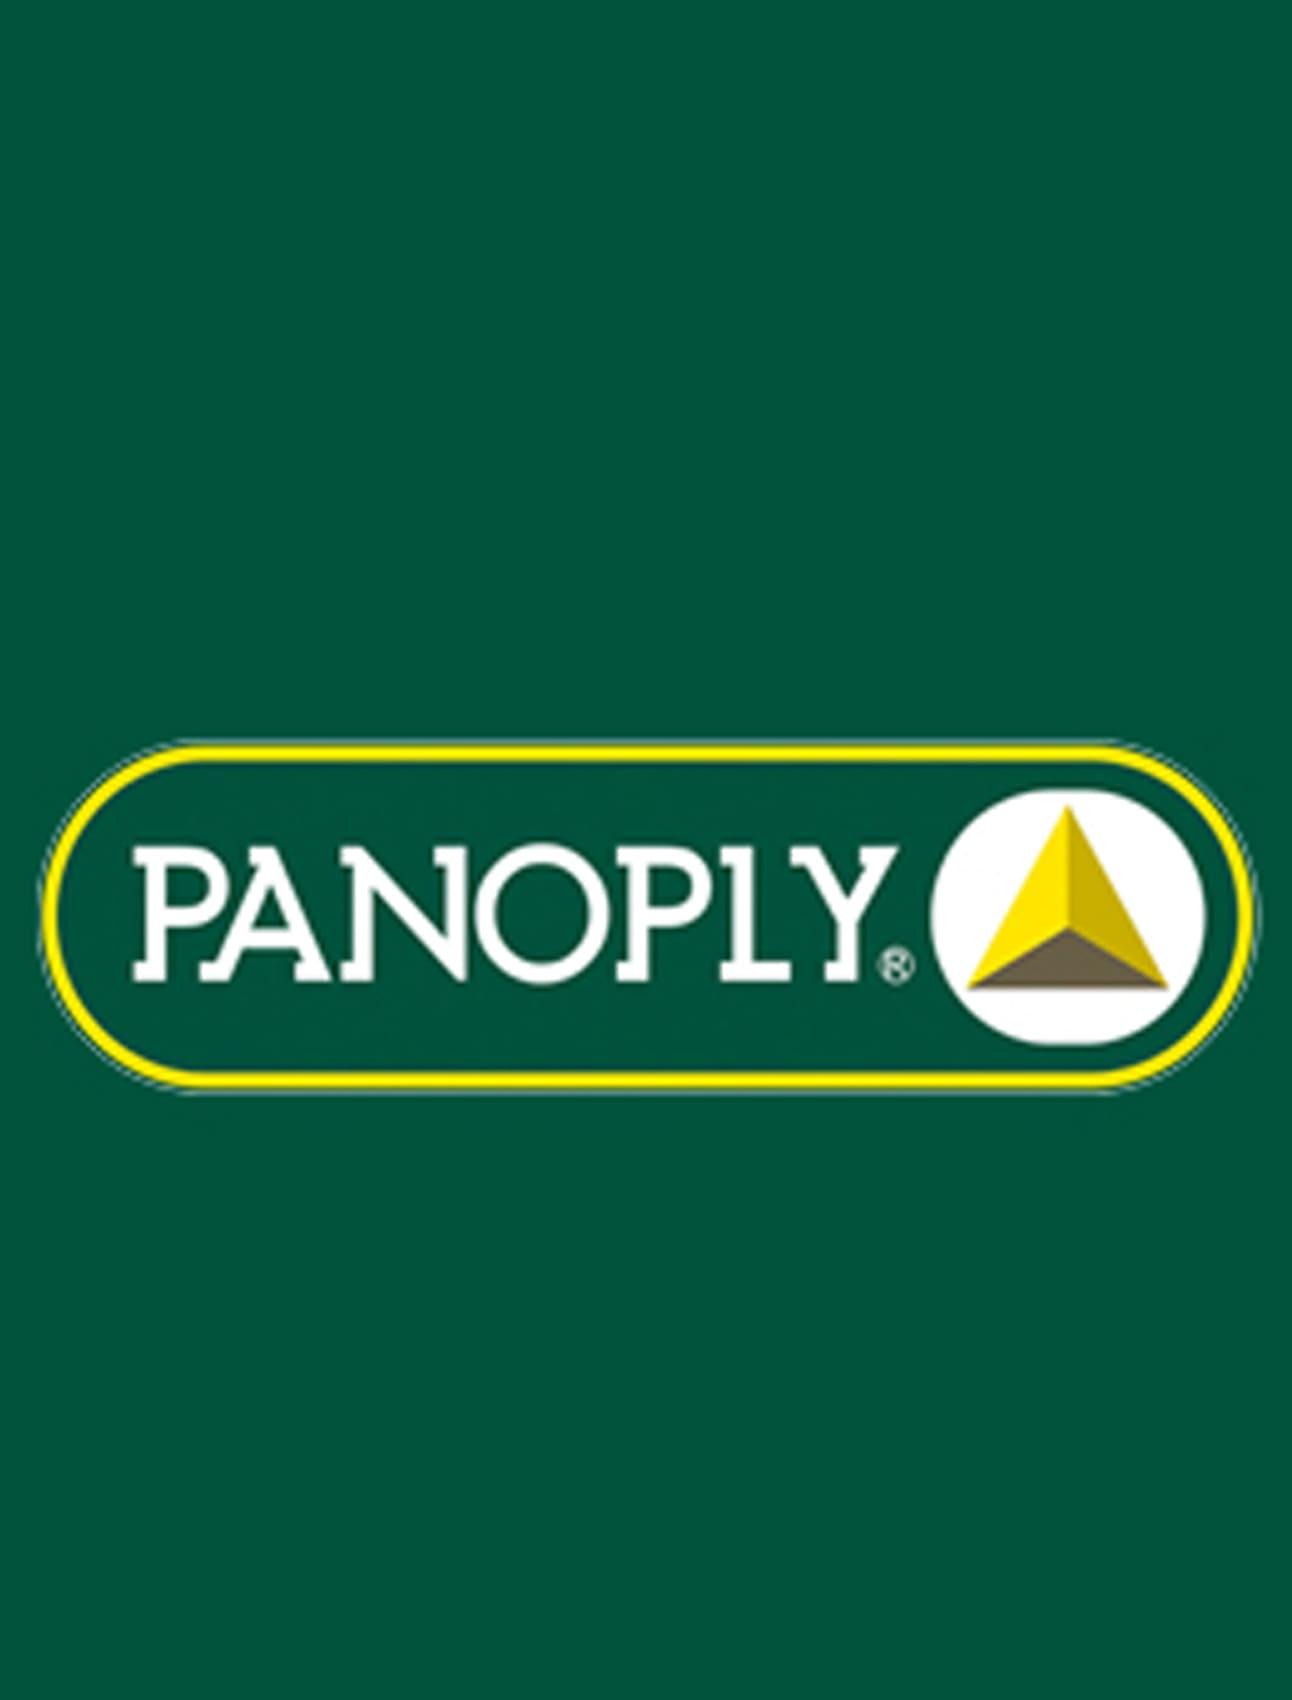 Panoply (1)